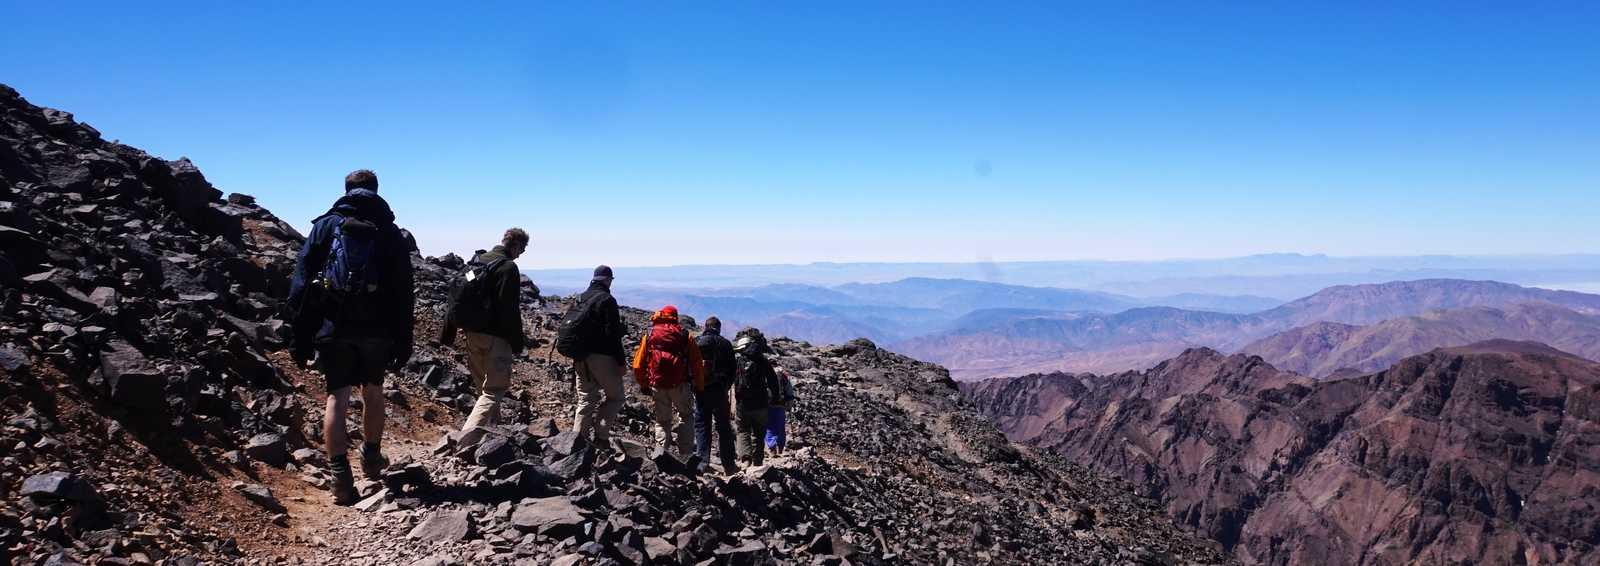 Trekkers on Toubkal